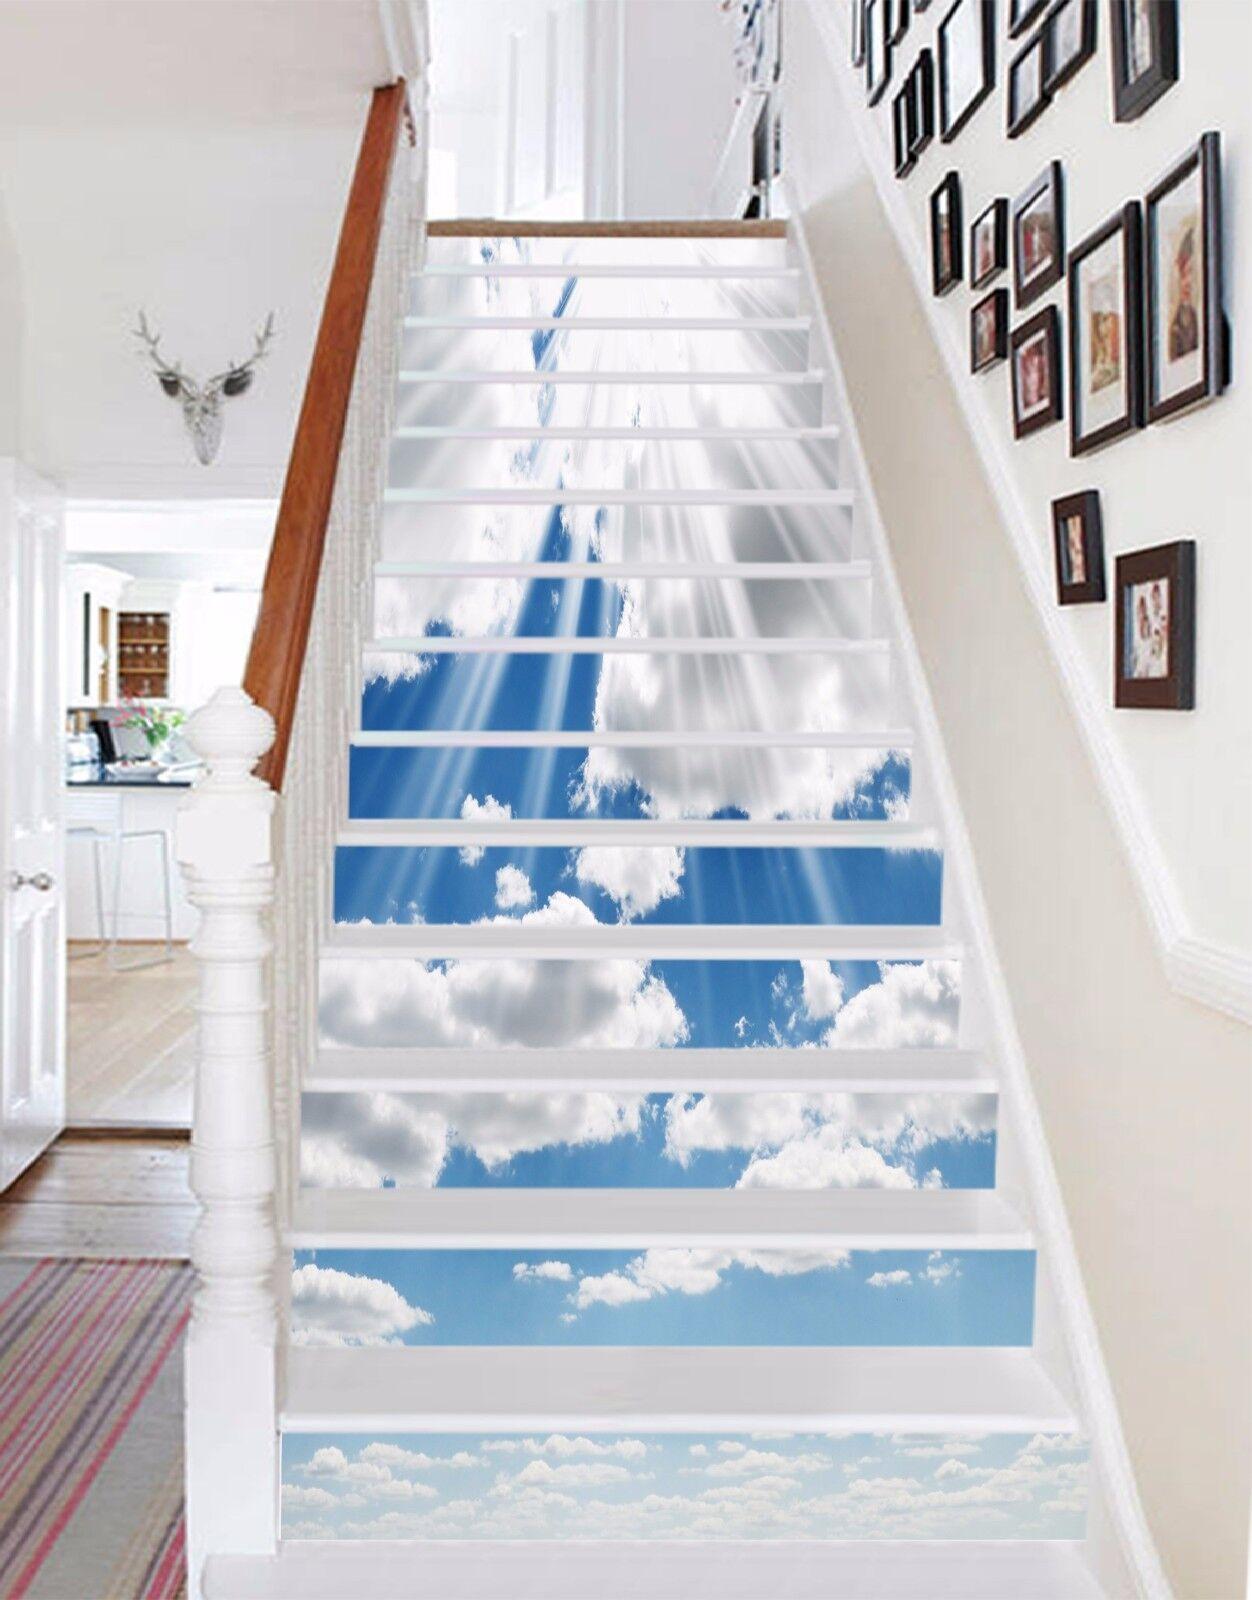 3D bianca clouds Stair Risers Decoration Photo Mural Vinyl Decal Wallpaper AU